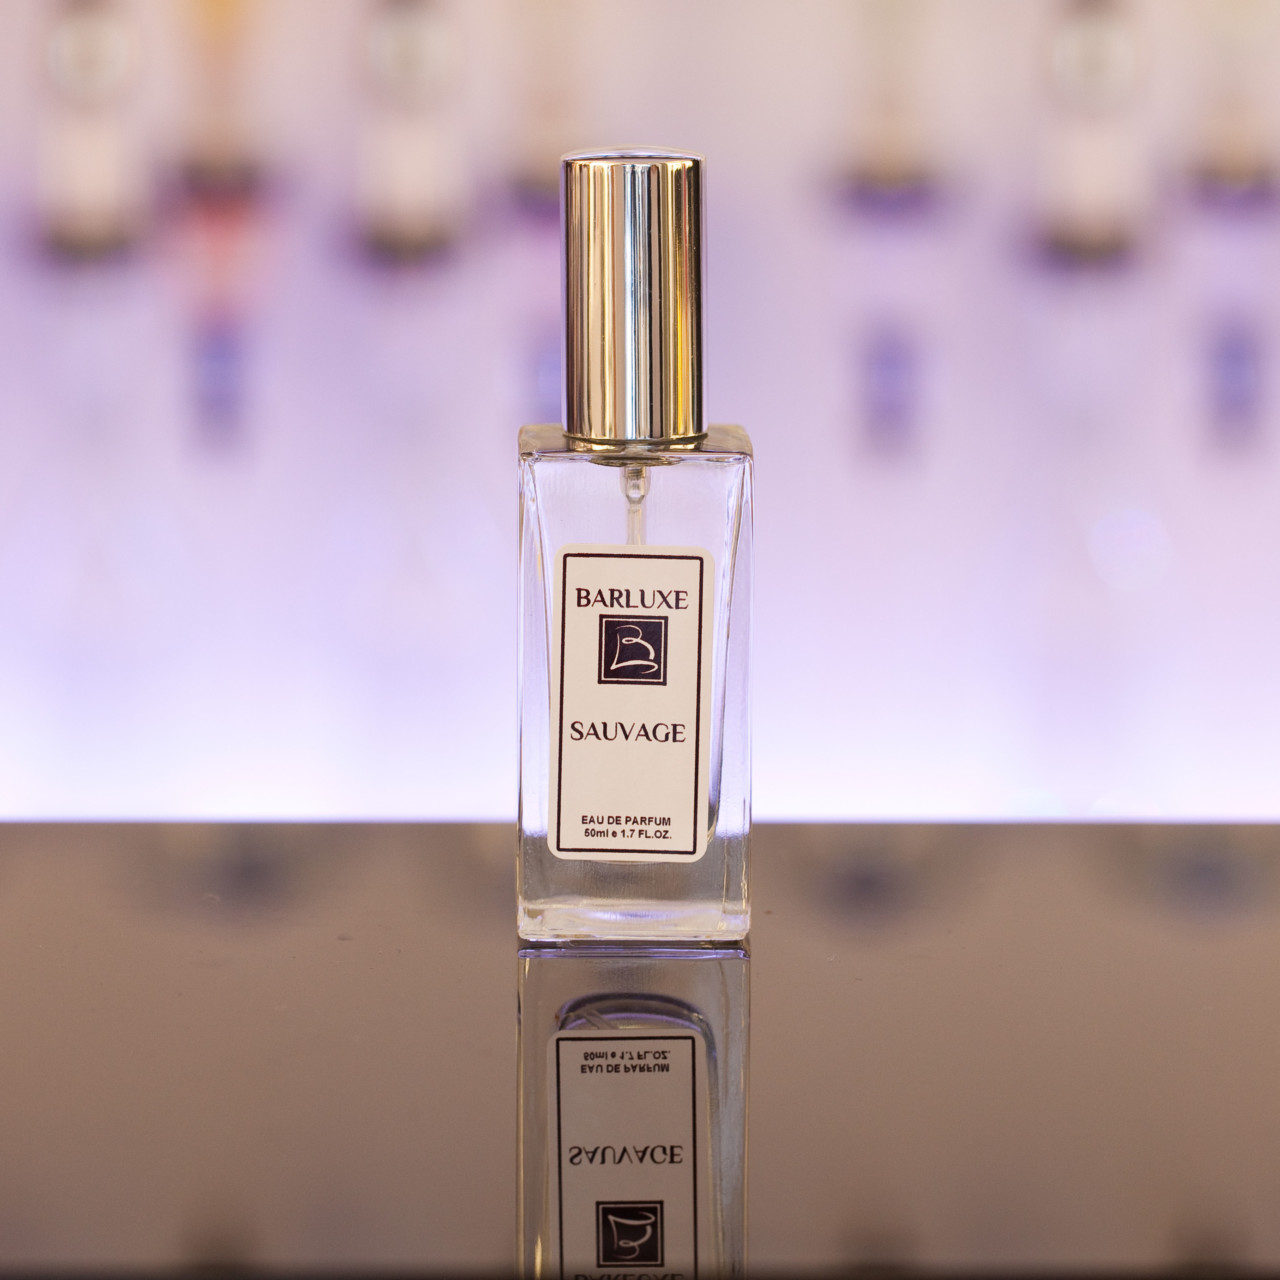 herren-parfum-dupe-double-duft-duftzwilling-sauvage